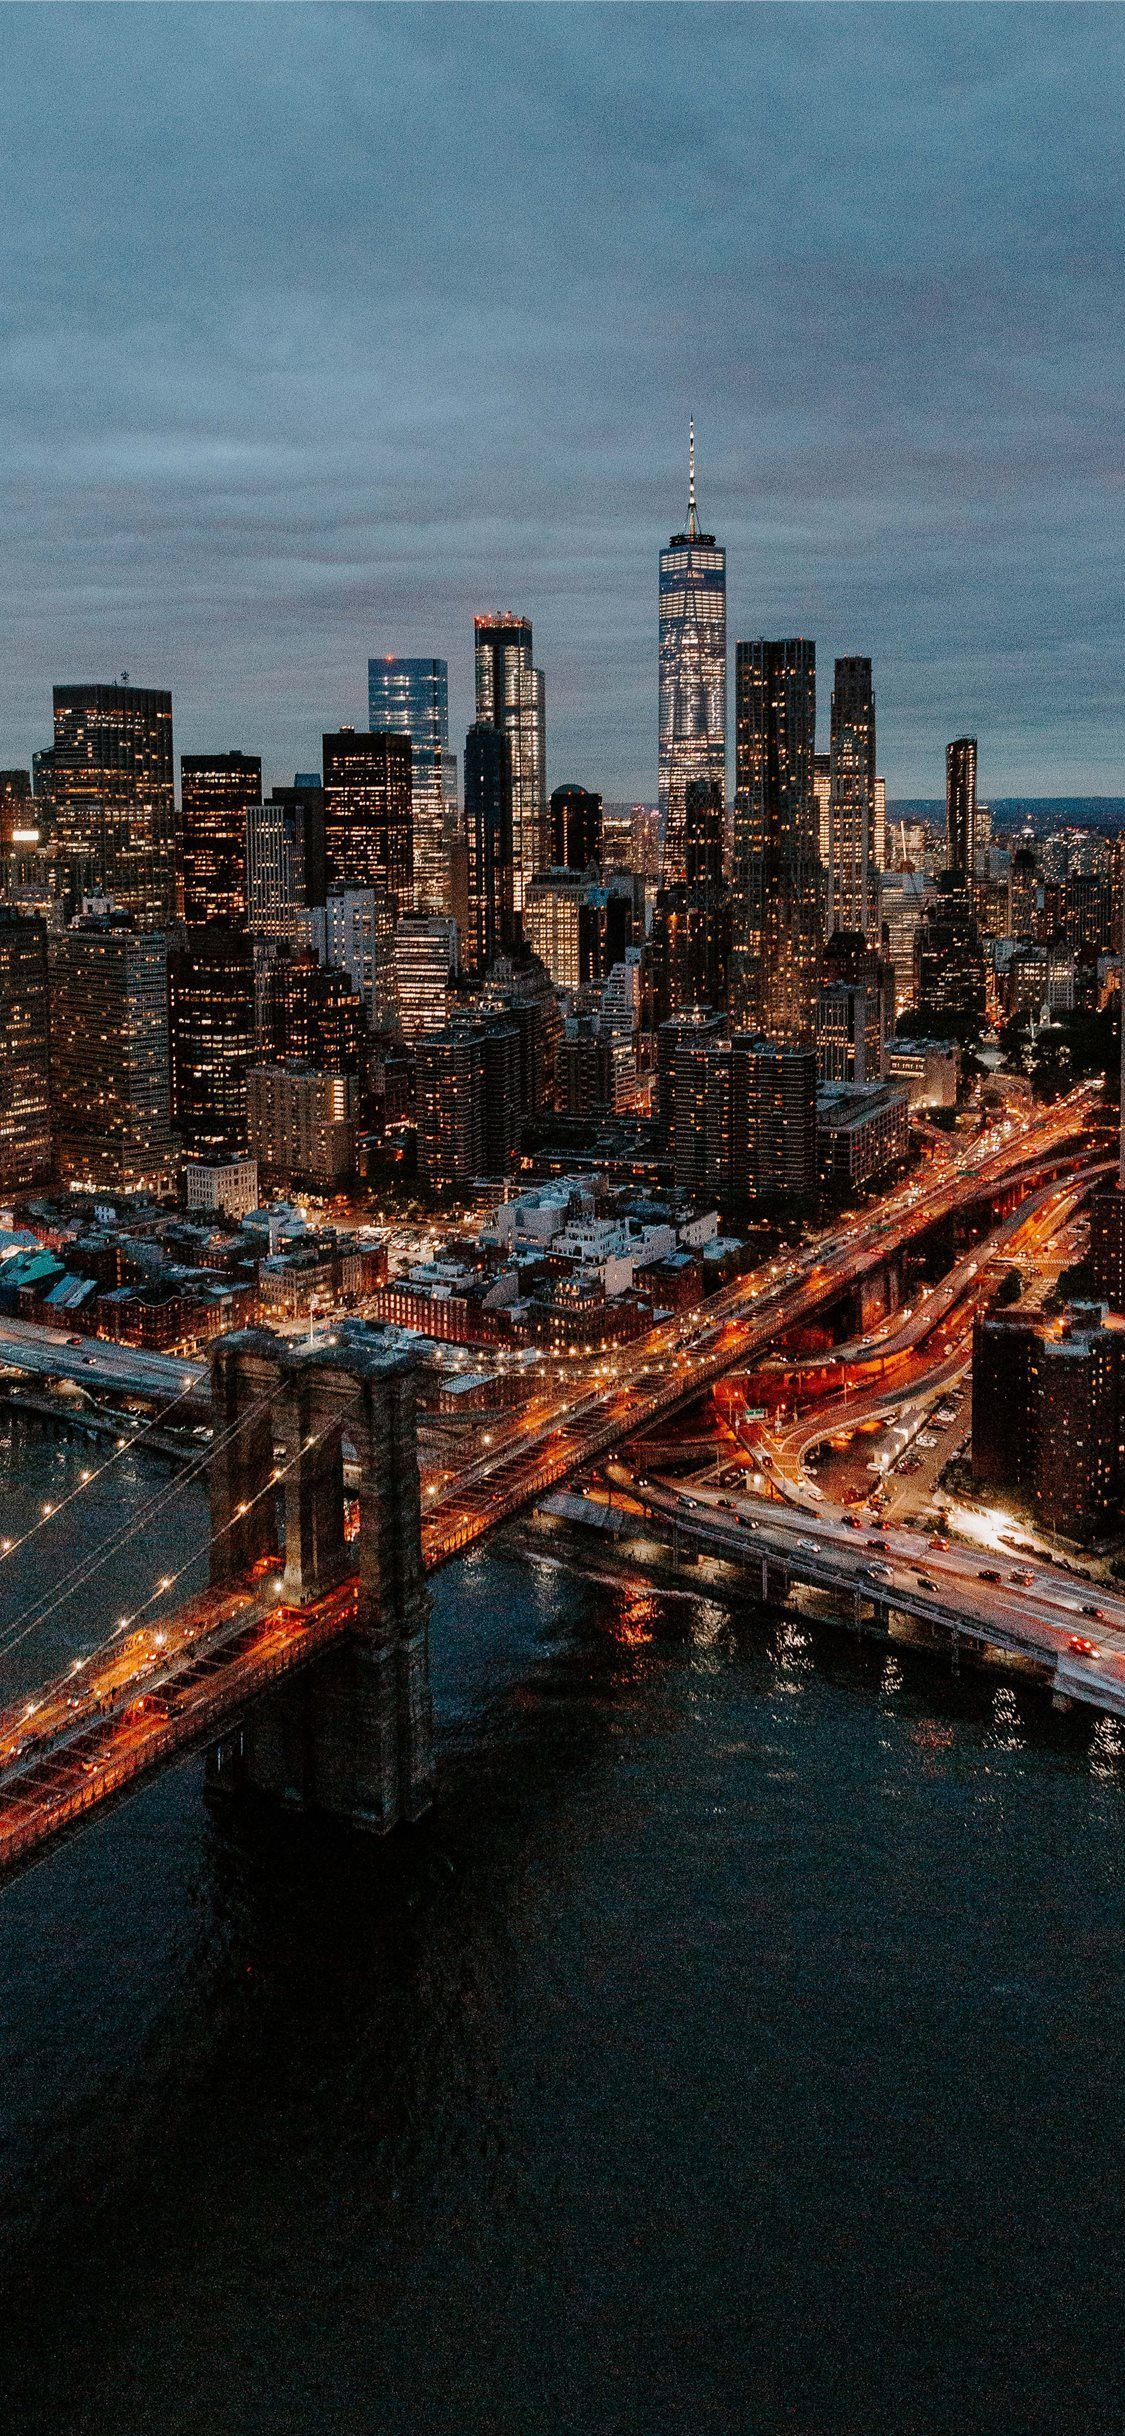 Free Download The Aerial Photography Of Buildings And Bridge Wallpaper Beaty Yo New York Wallpaper City Aesthetic York Wallpaper